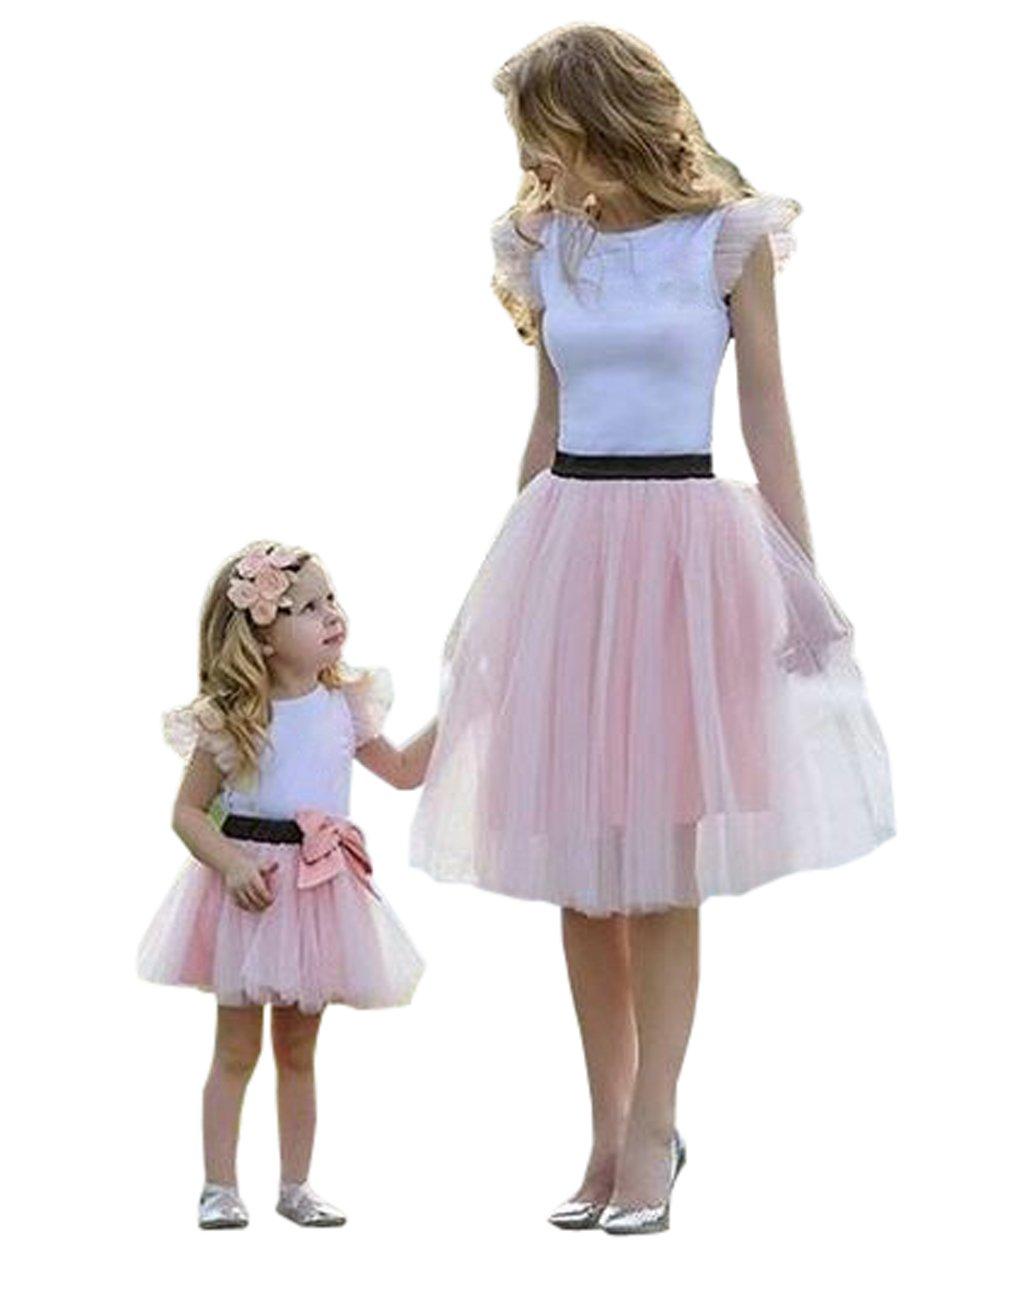 Family Matching Mom Baby Girls White Tshirt Top and Pink Tutu Skirt Clothing Sets matching dress